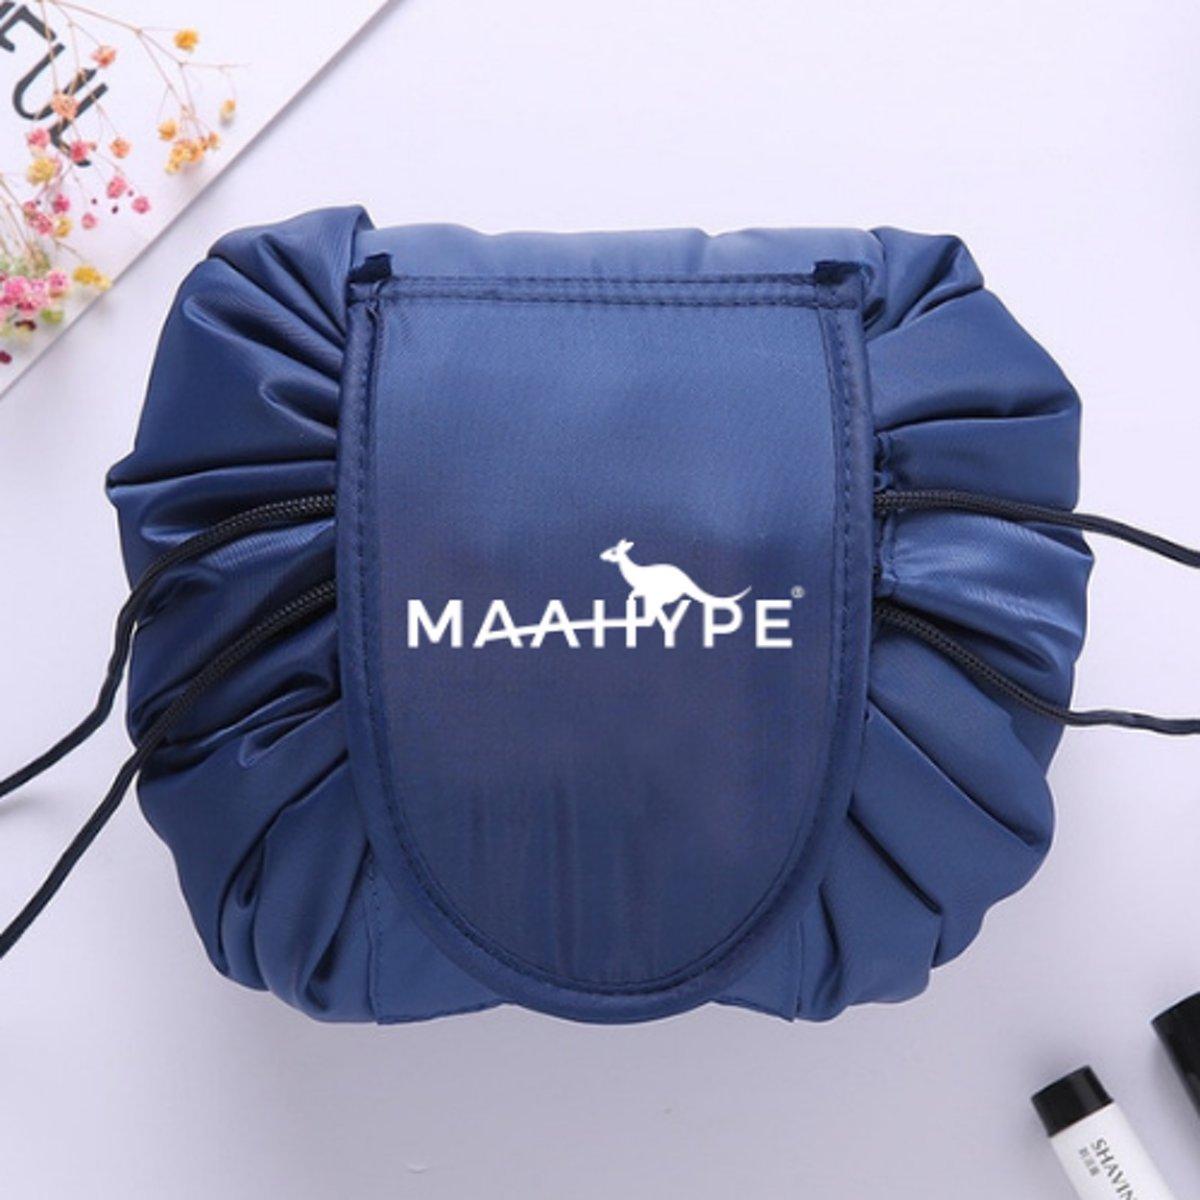 MaaHype Make-up organiser - Makeup opbergen - Accesoires organiser - Opbergsysteem - Reis toilettas - donkerblauw kopen